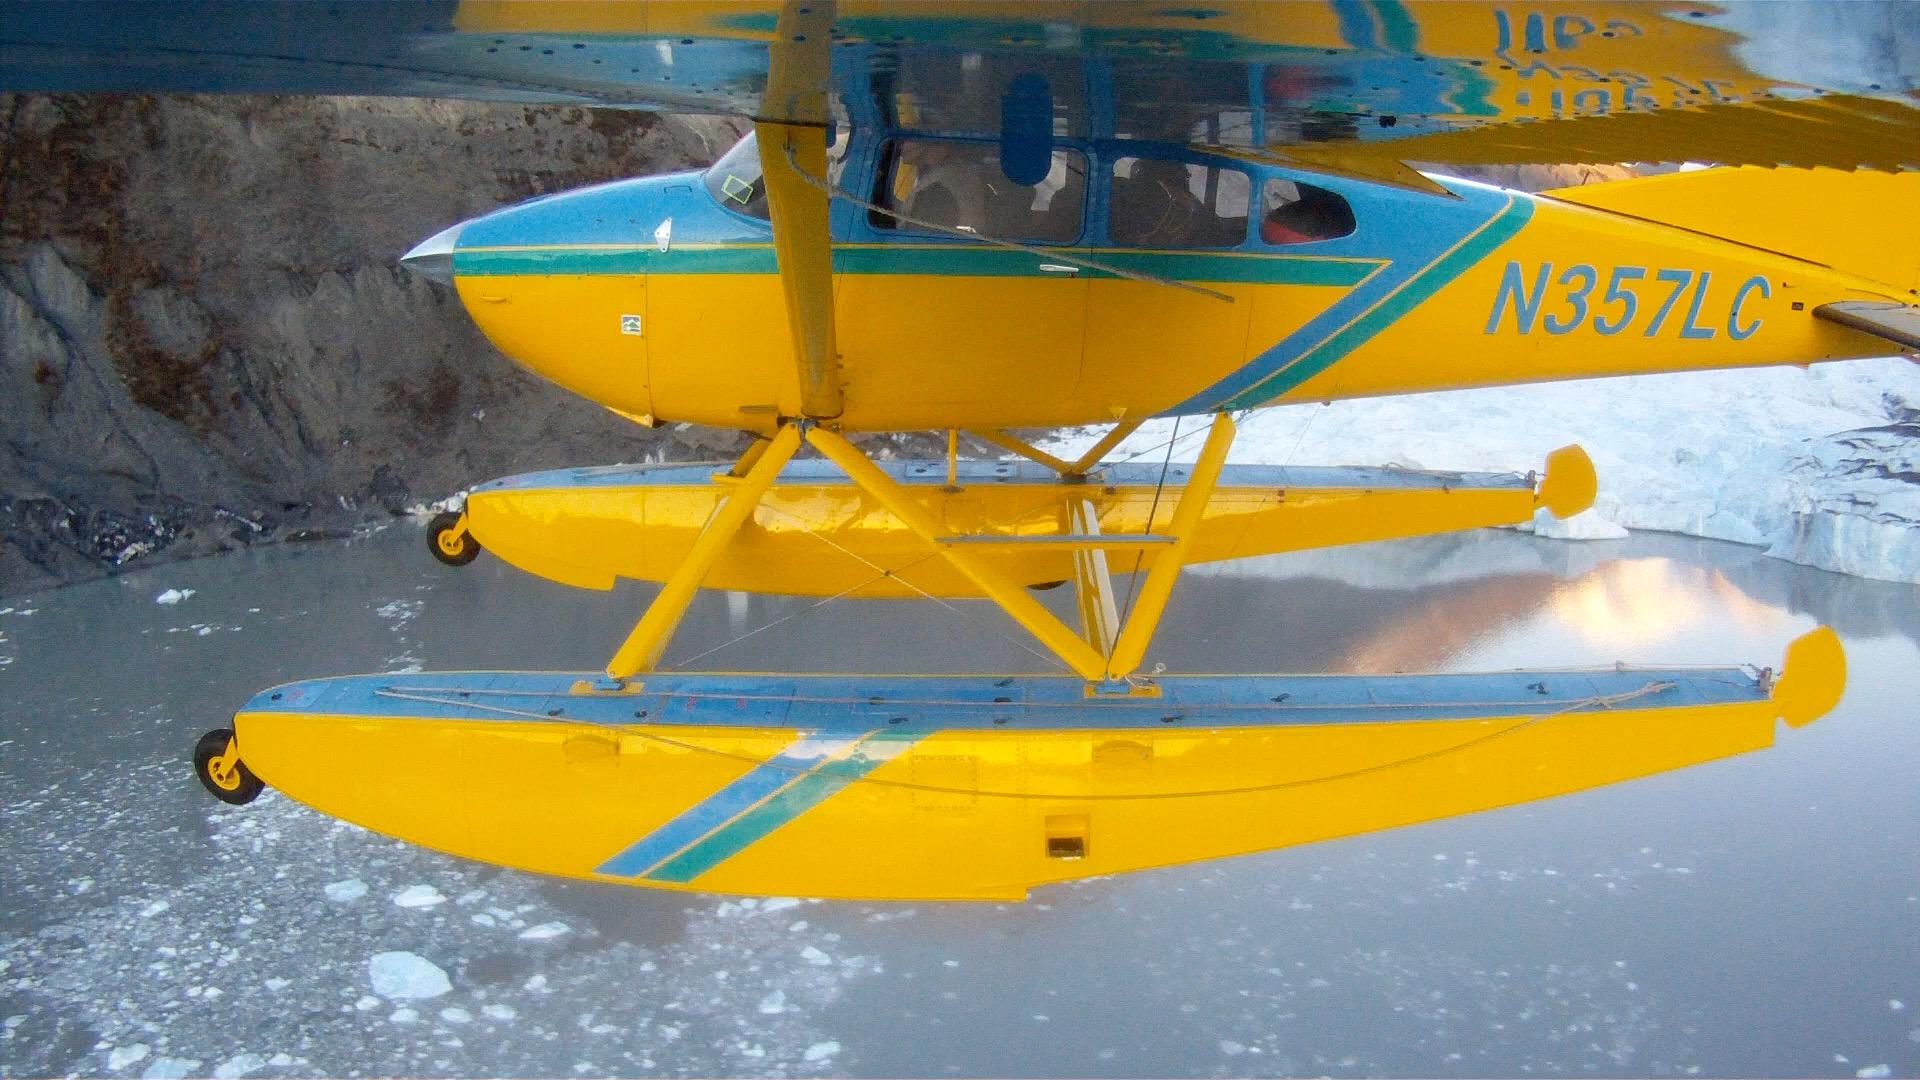 20 mi off wing